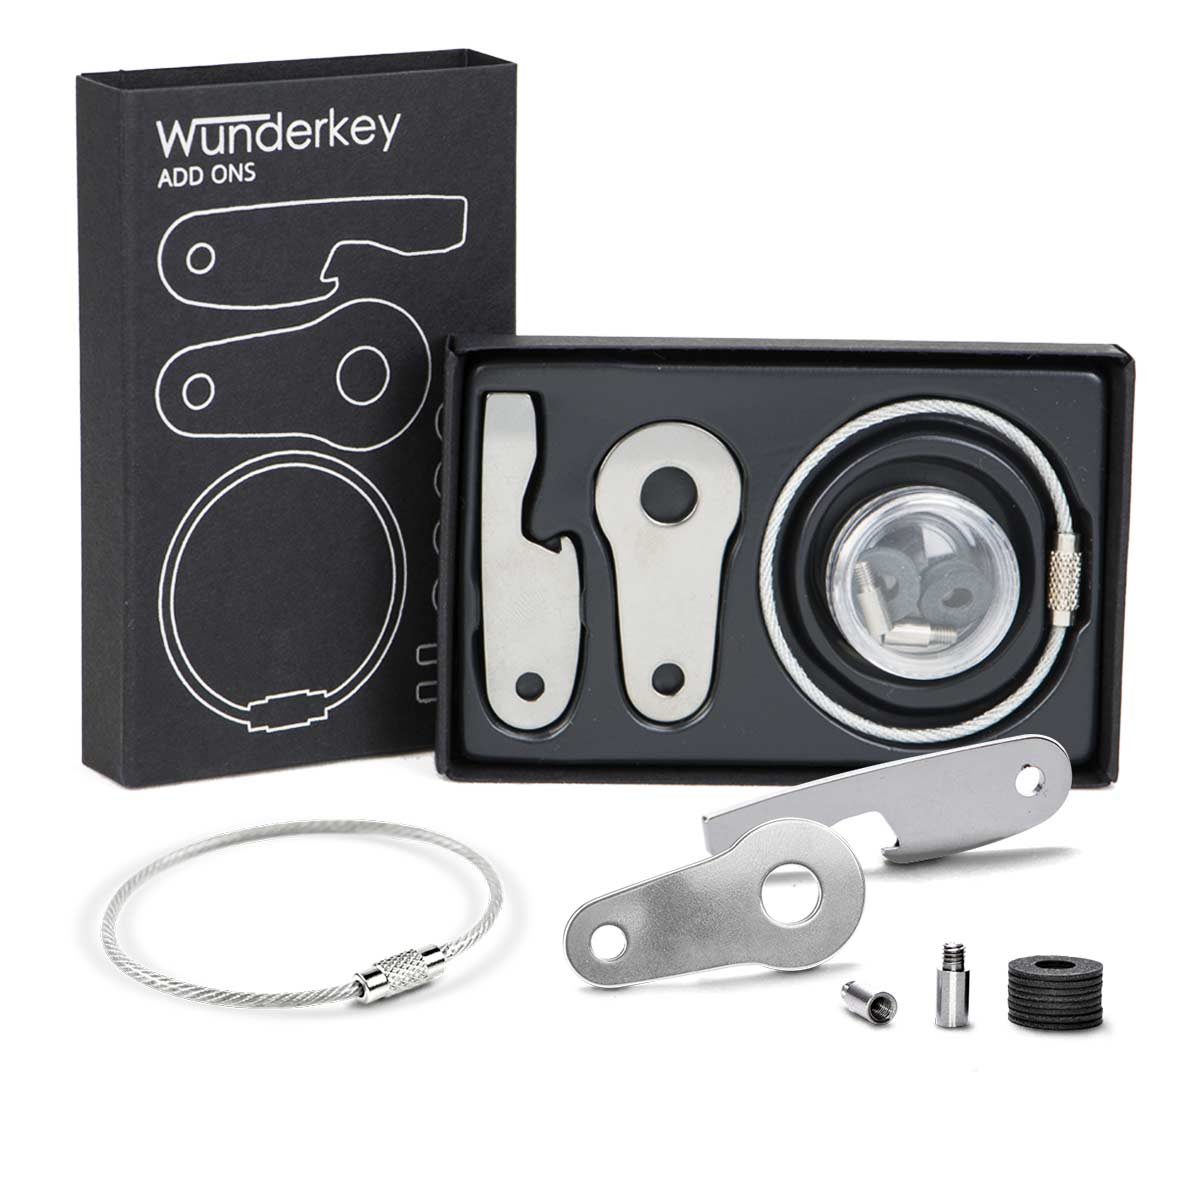 23863f3567 Wunderkey add on accessori extra – carpe diem